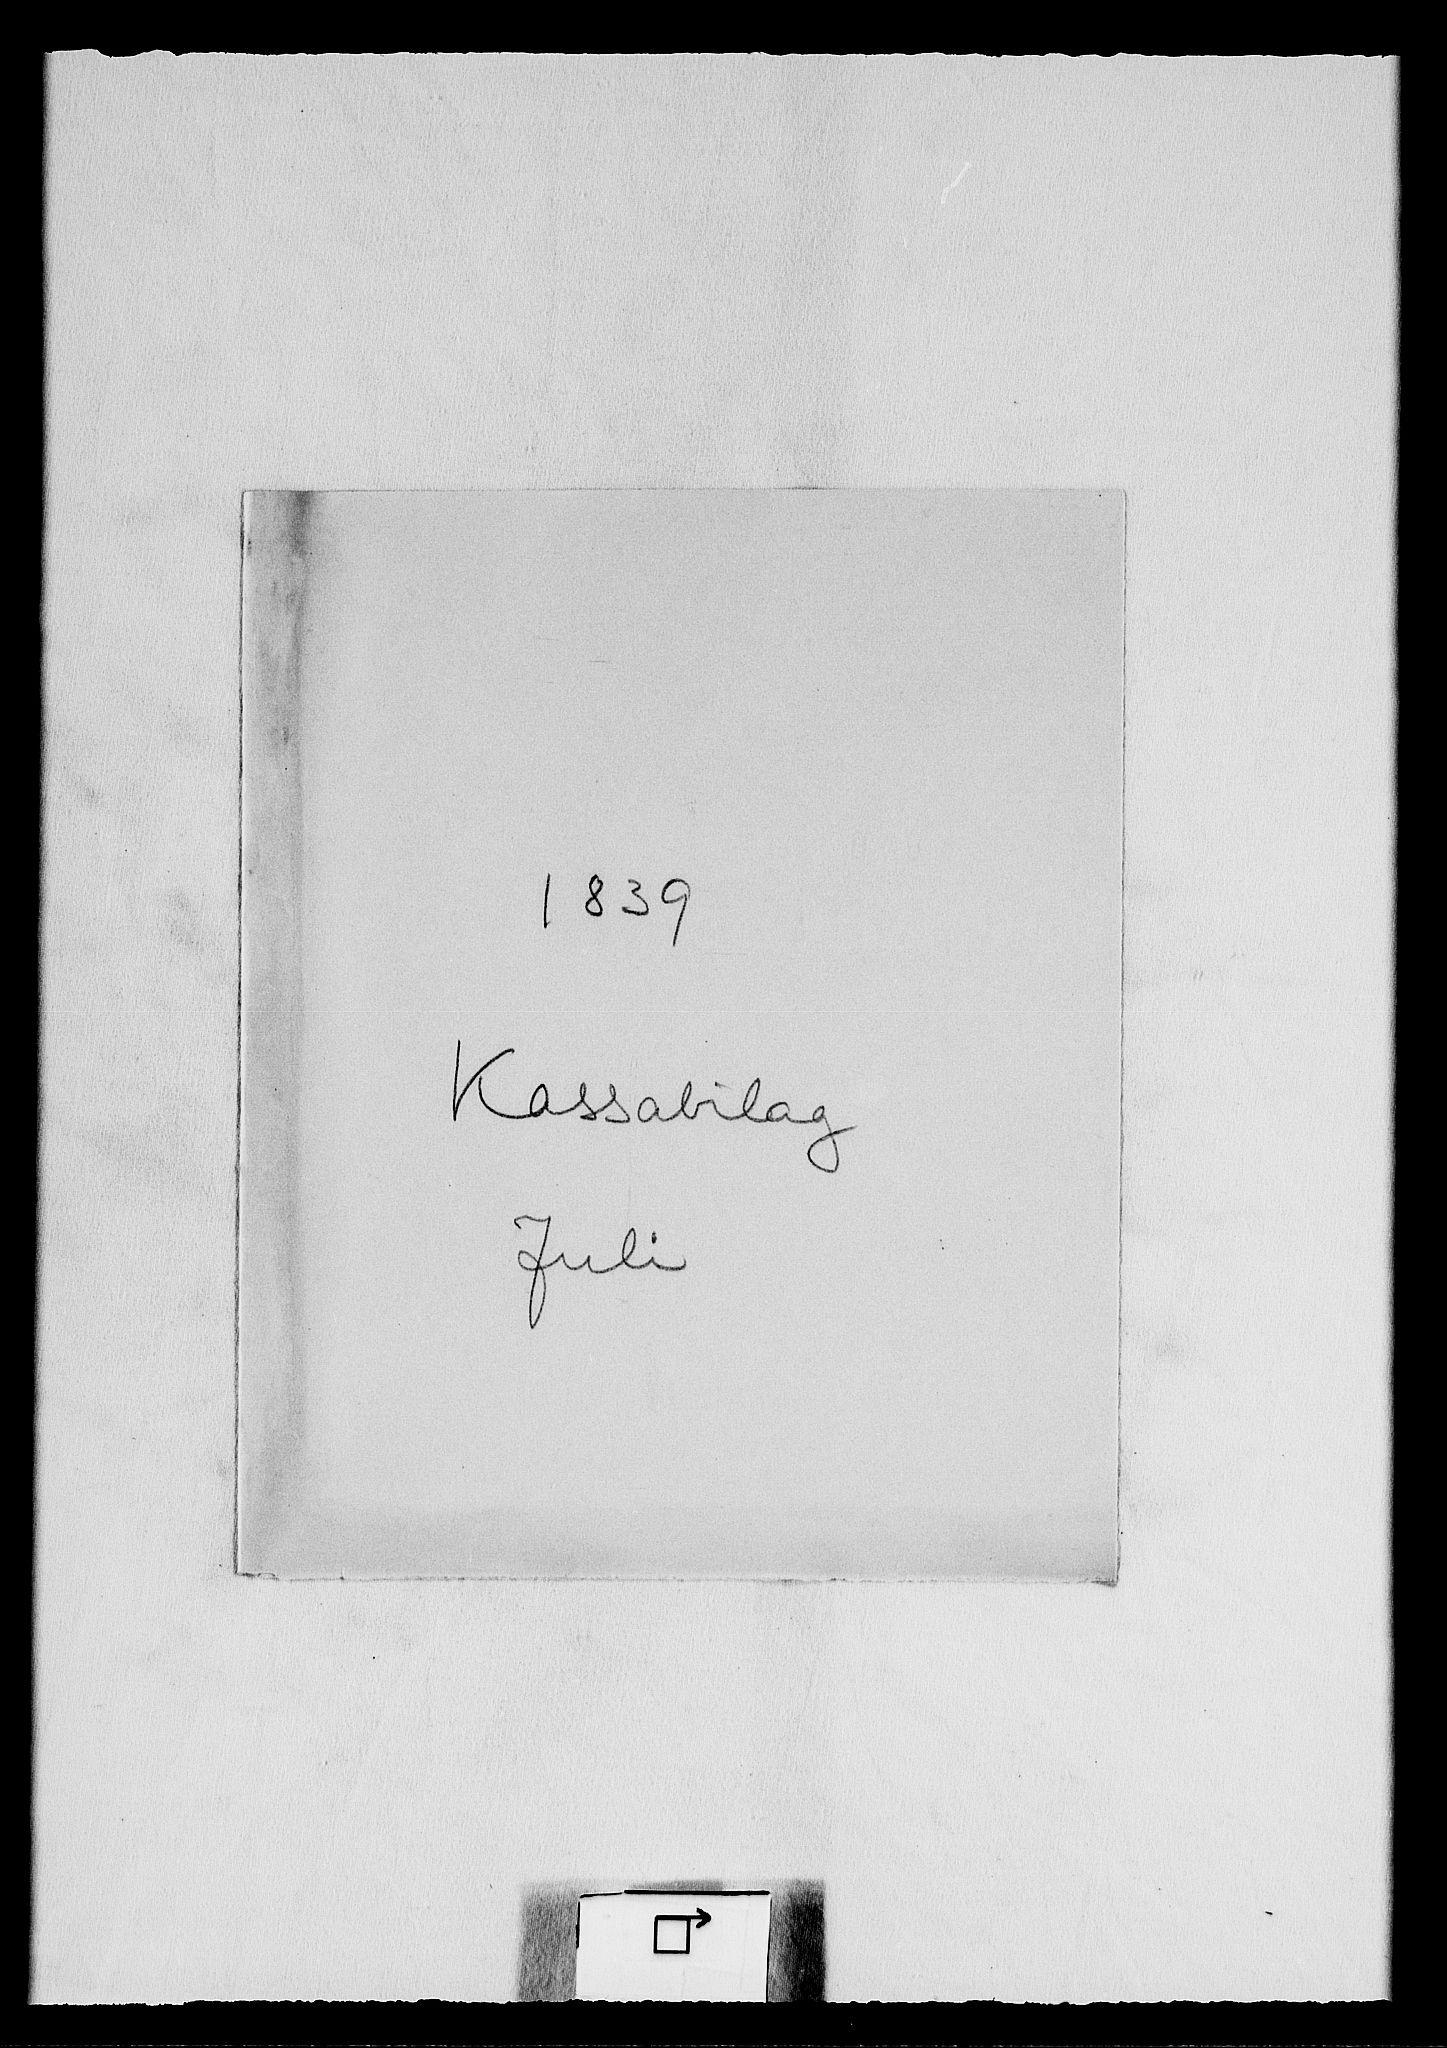 RA, Modums Blaafarveværk, G/Gd/Gdc/L0238, 1839-1840, s. 2